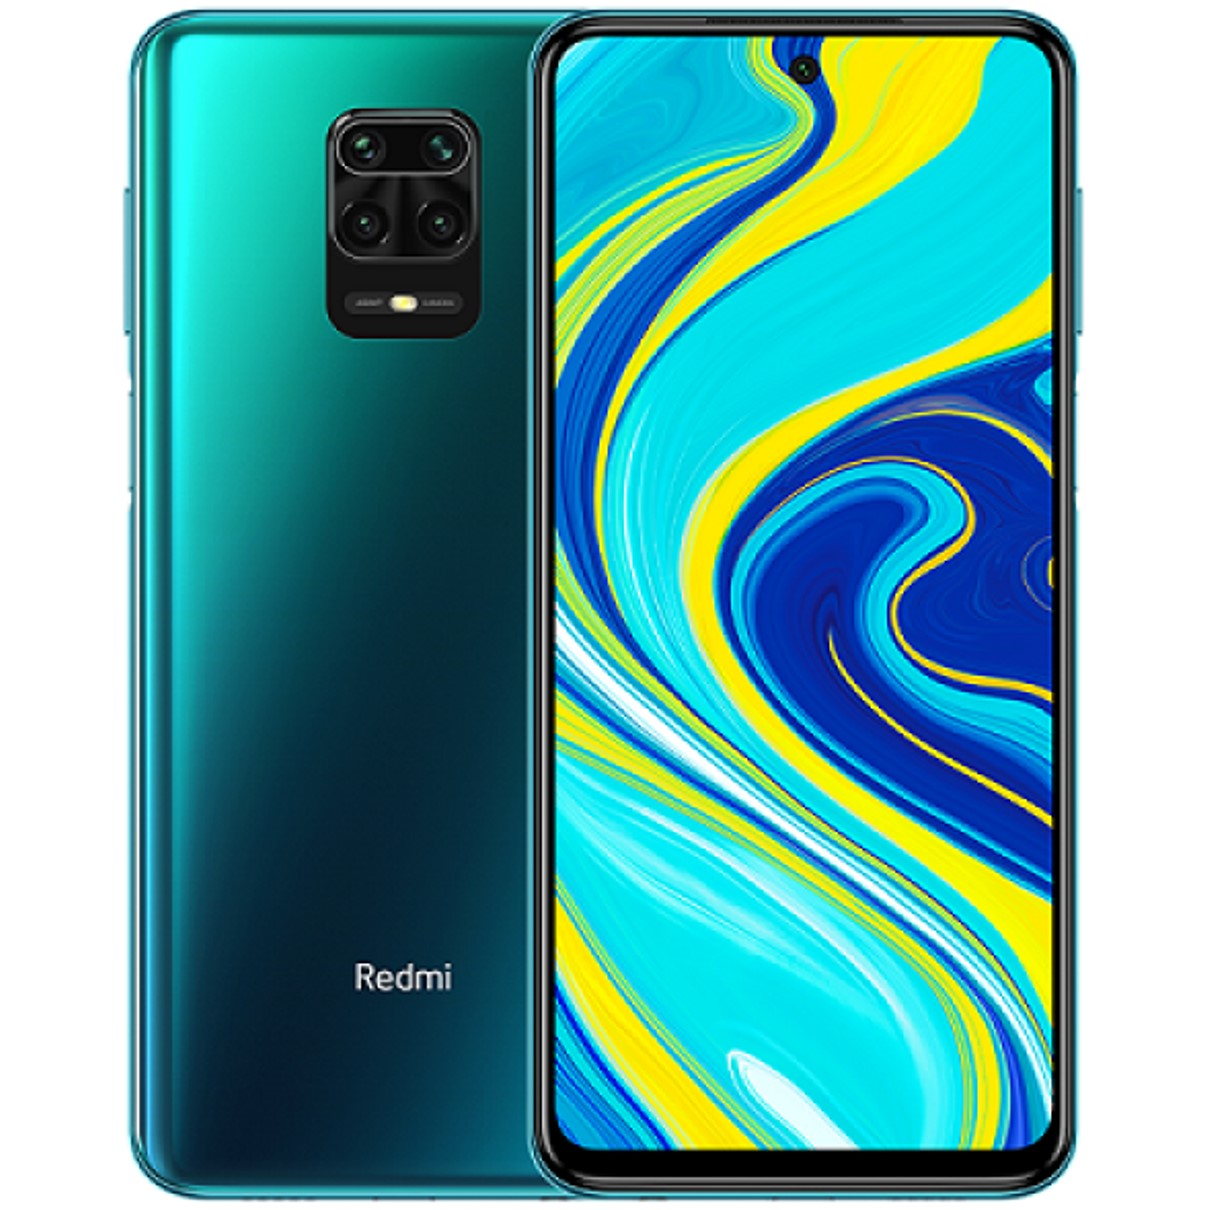 "TELEFONO MOVIL SMARTPHONE XIAOMI REDMI NOTE 9S AURORA BLUE / 6.67""/ 128GB ROM/ 6GB RAM/ 48+8+5+2MPX/ 16MPX/ 5020 MAH/ 5G/ HUELLA/ OCTA CORE"